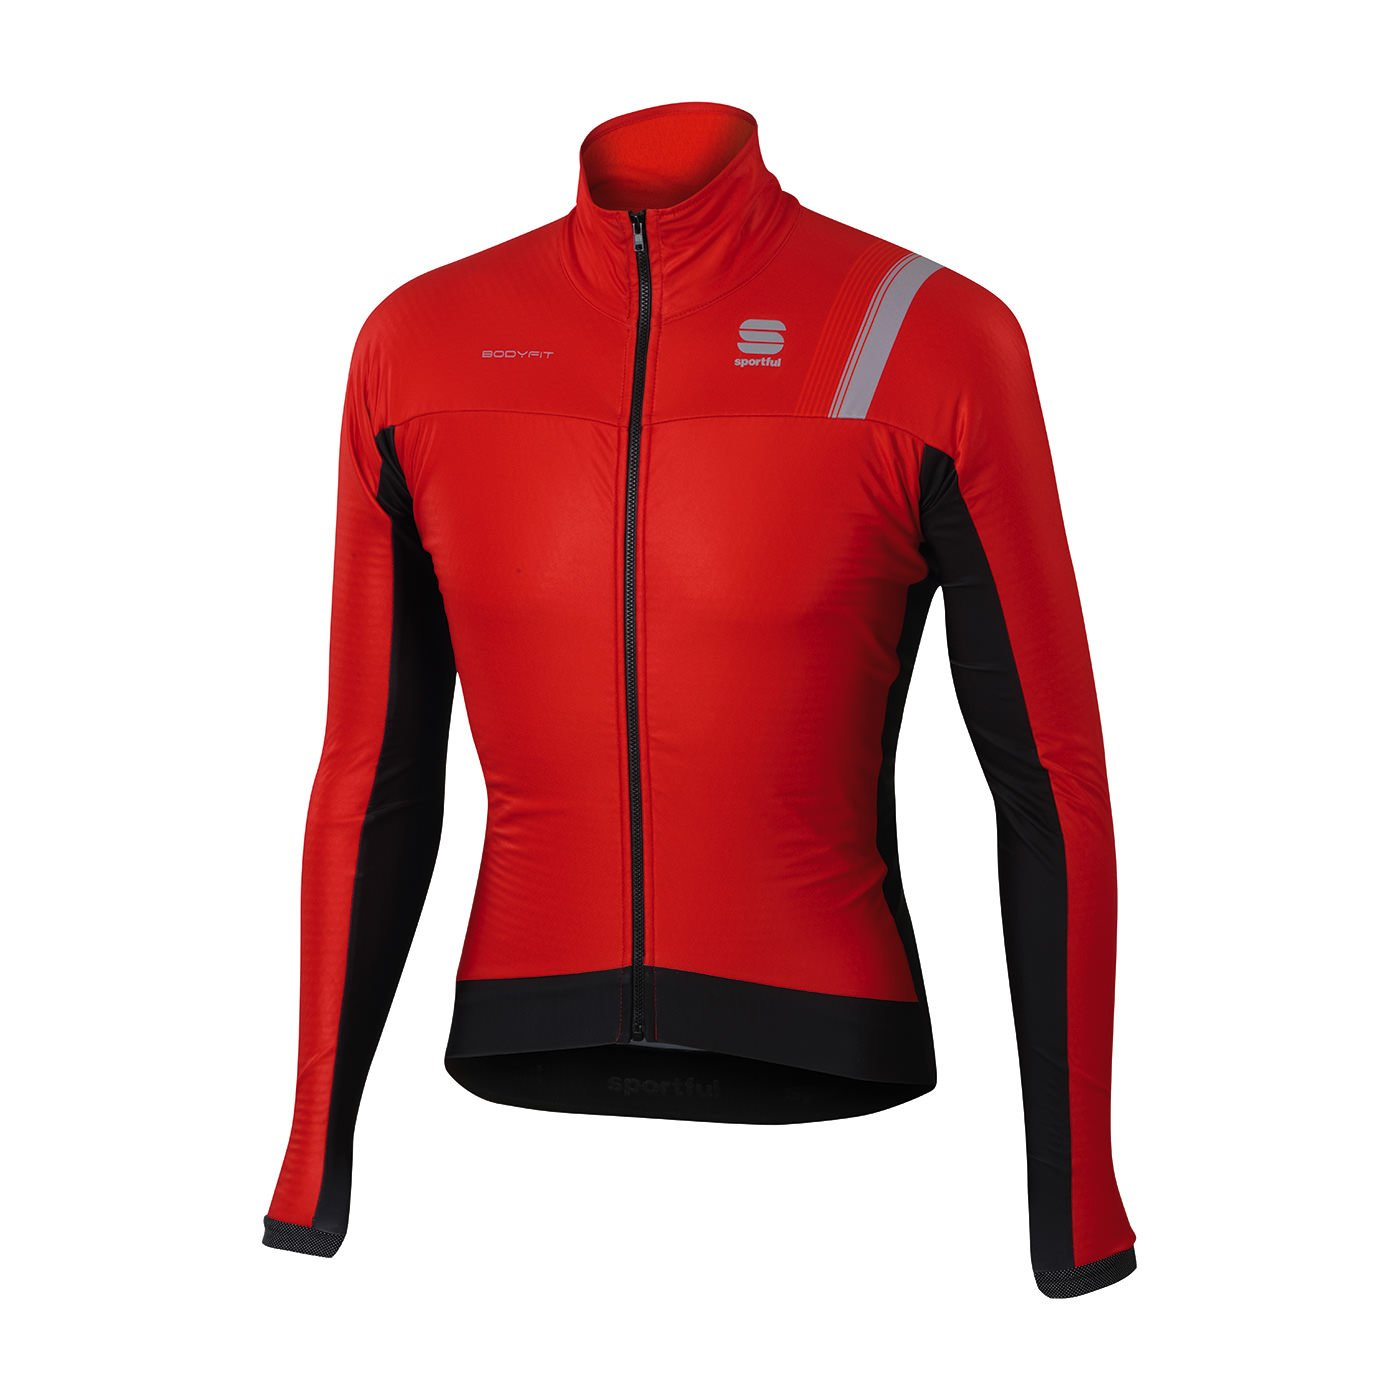 Chaqueta Sportful Bodyfit Pro Thermal Negro-Rojo 2017 ...